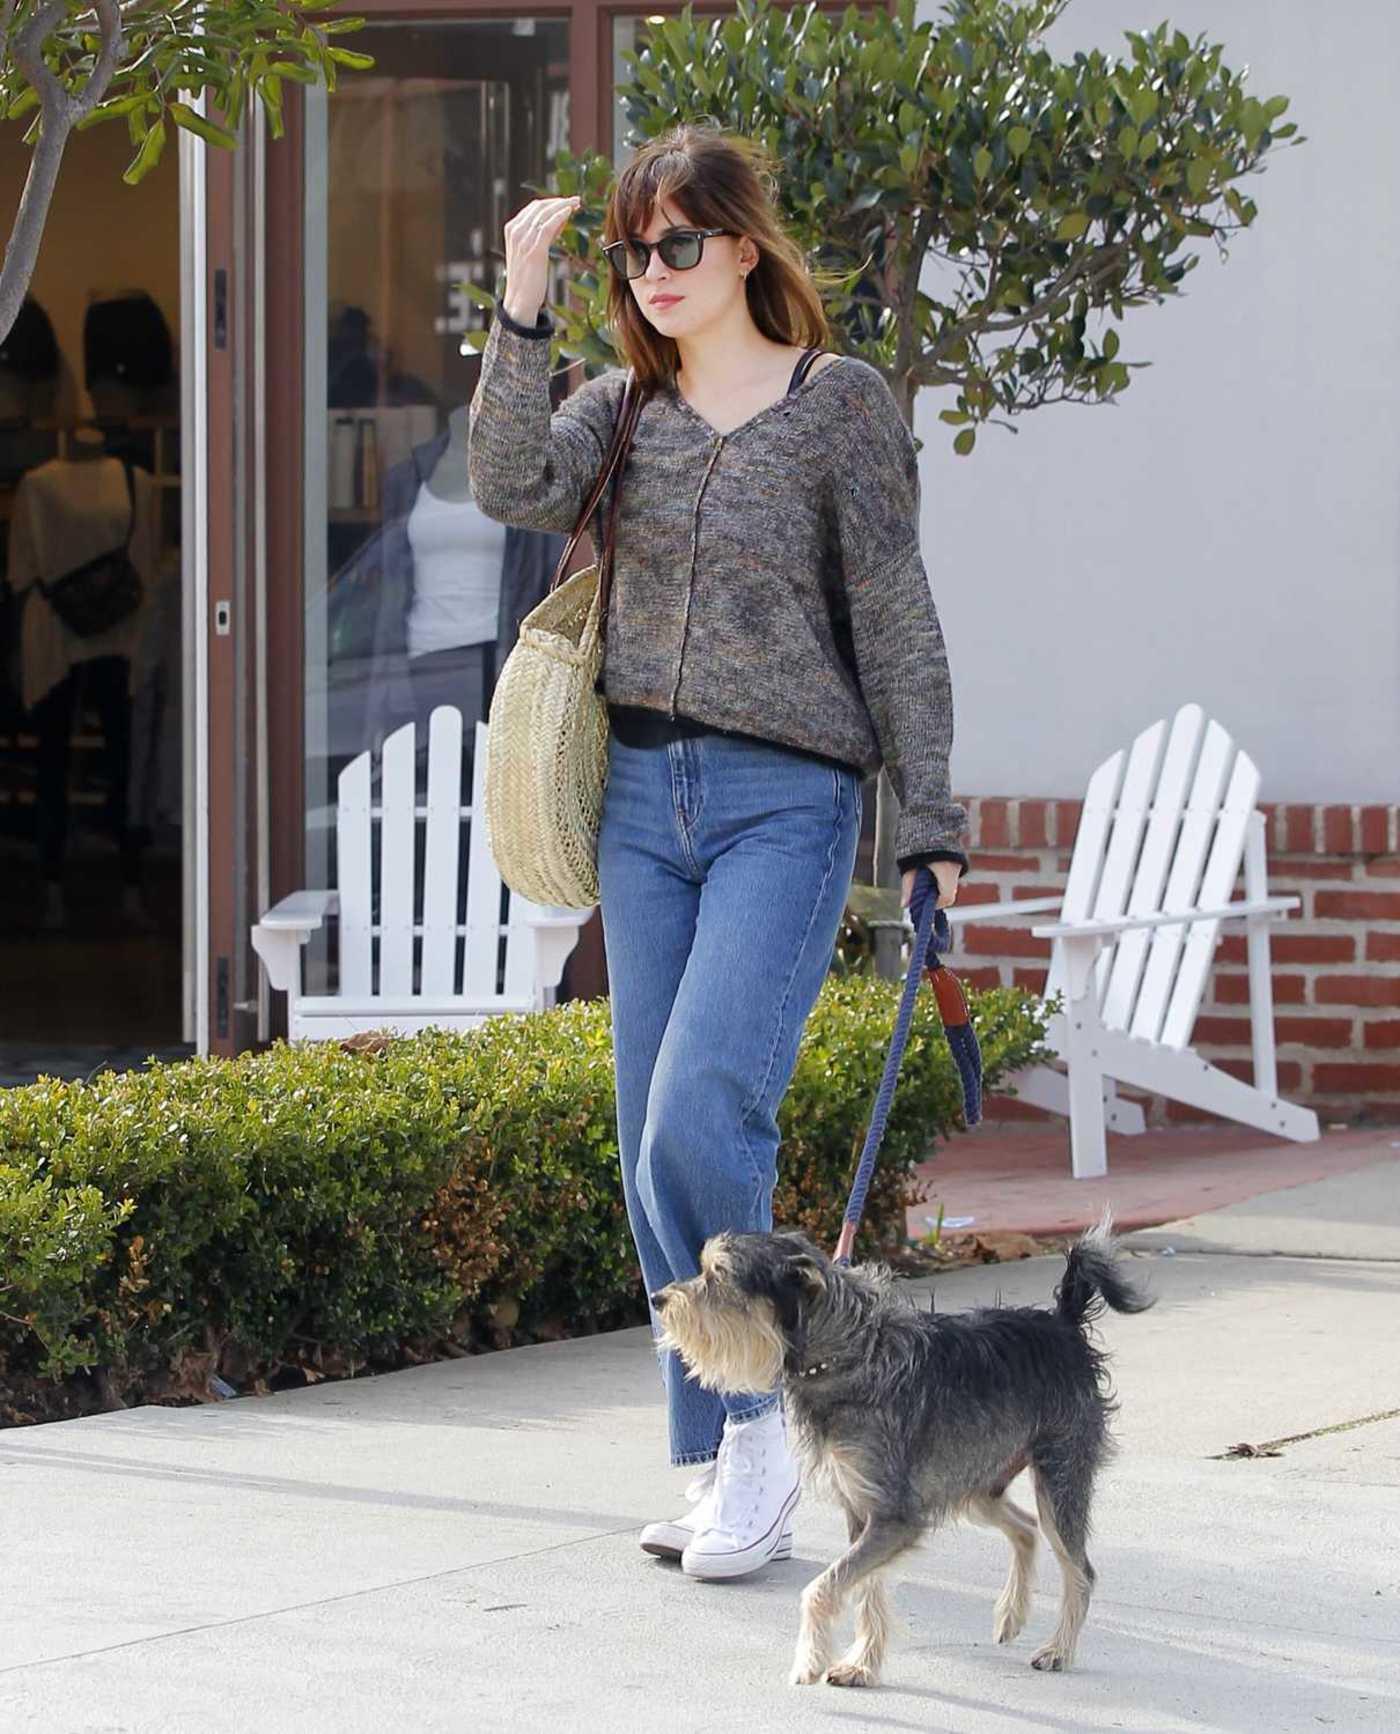 Dakota Johnson Walks Her Dog Out in Beverly Hills 12/13/2018